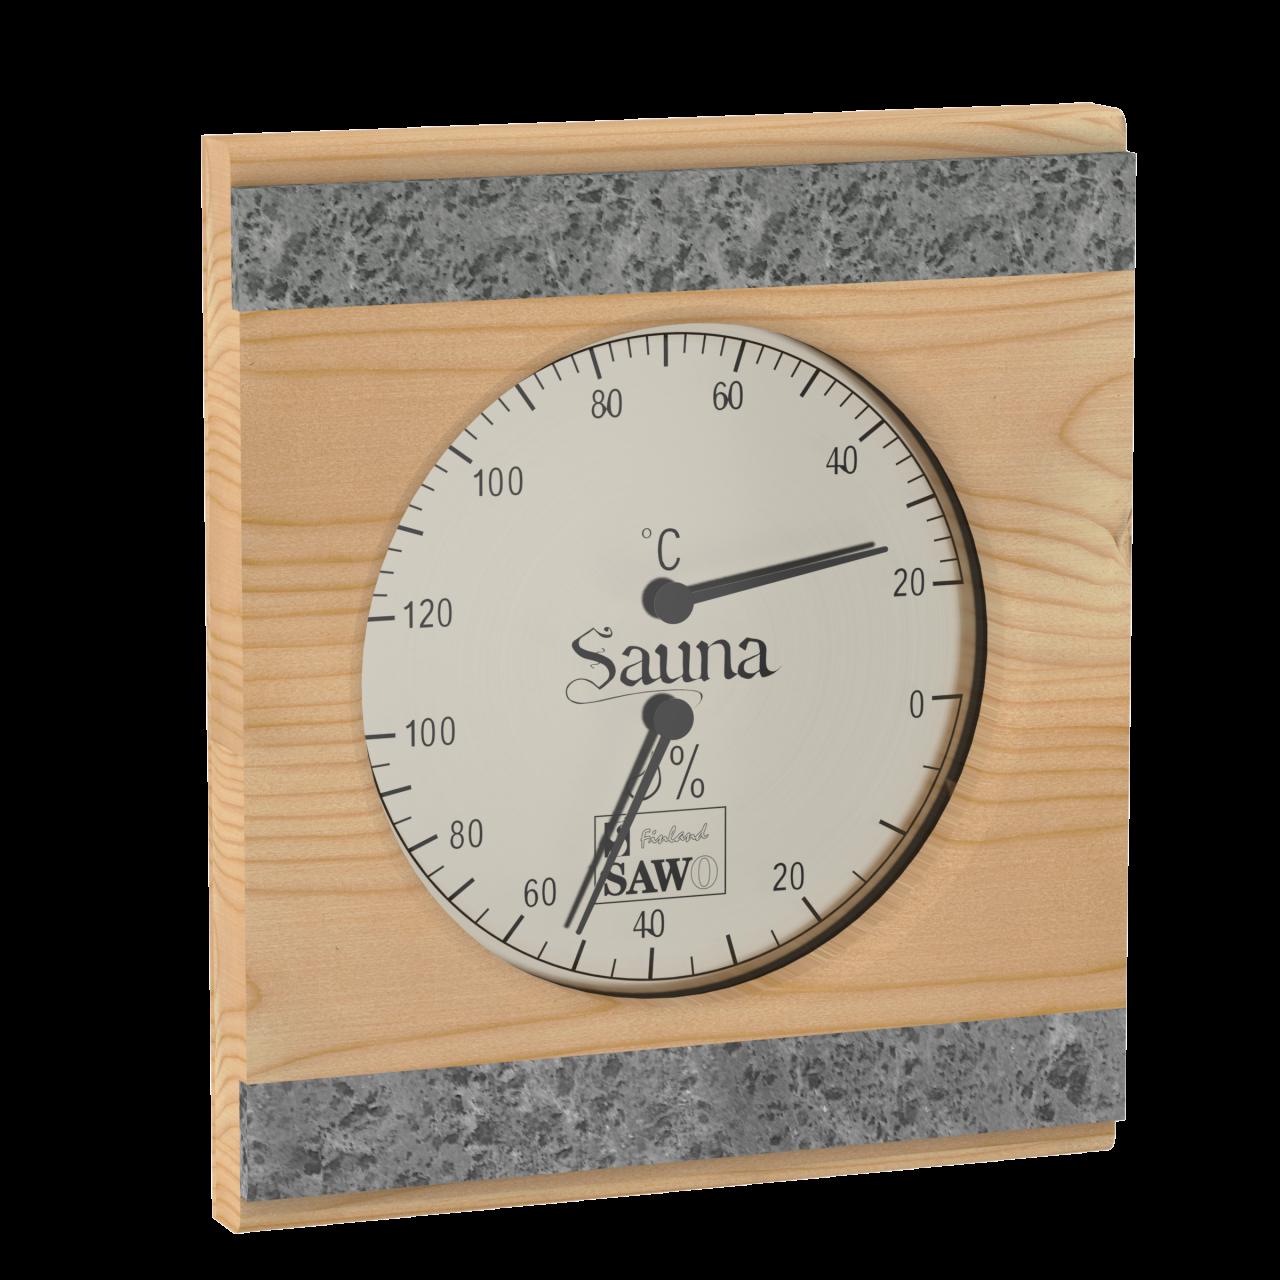 Thermo-hygrometer speksteen